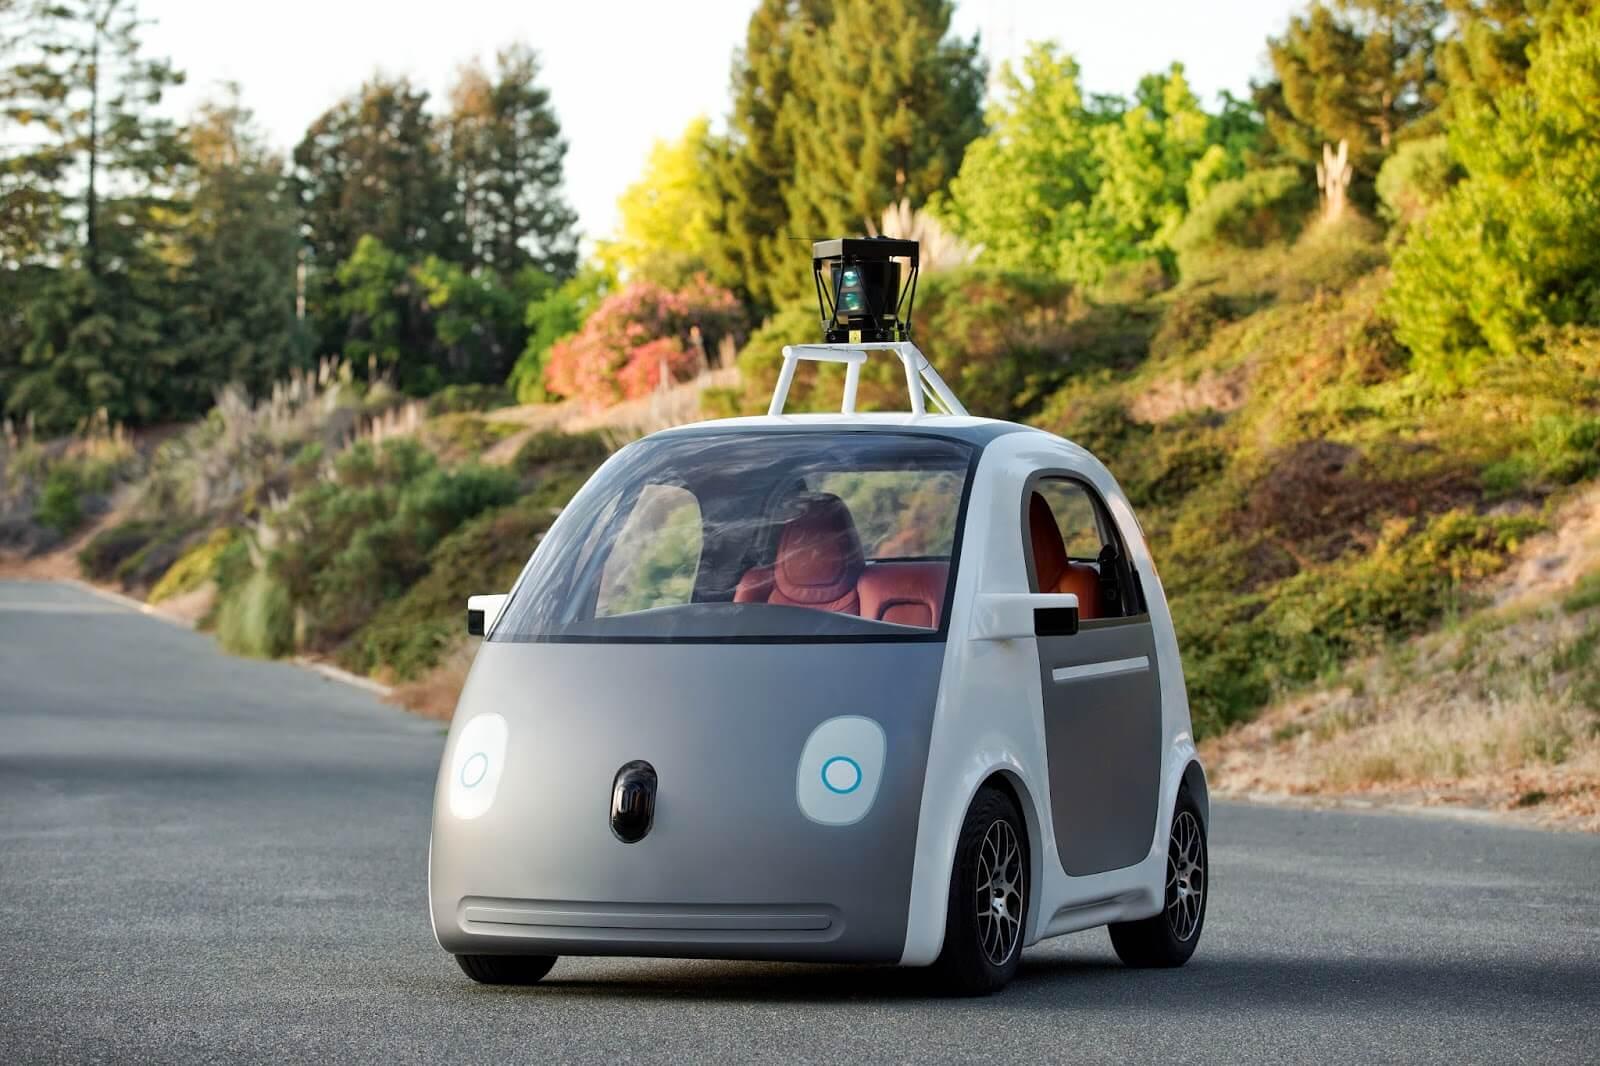 Google's self-driving car Waymo